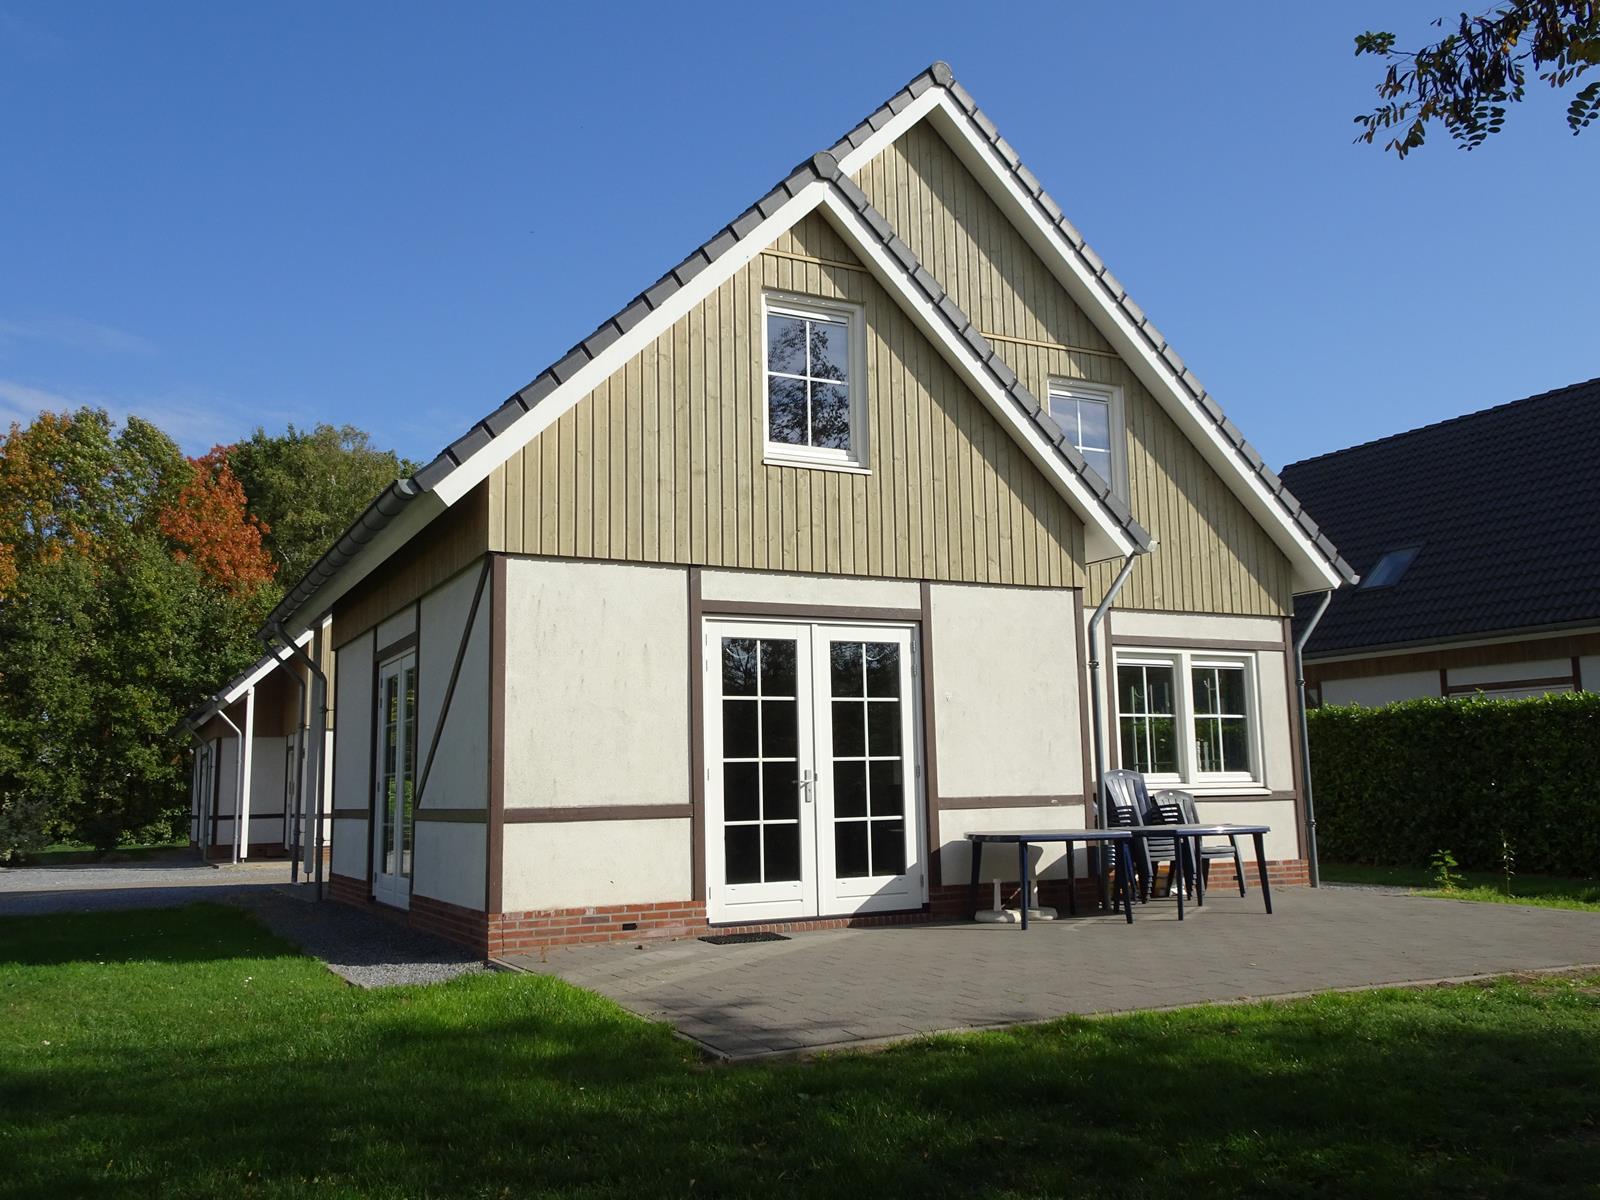 Vakantiehuis te koop Limburg Susteren Hommelweg 2 K808 (1).jpg